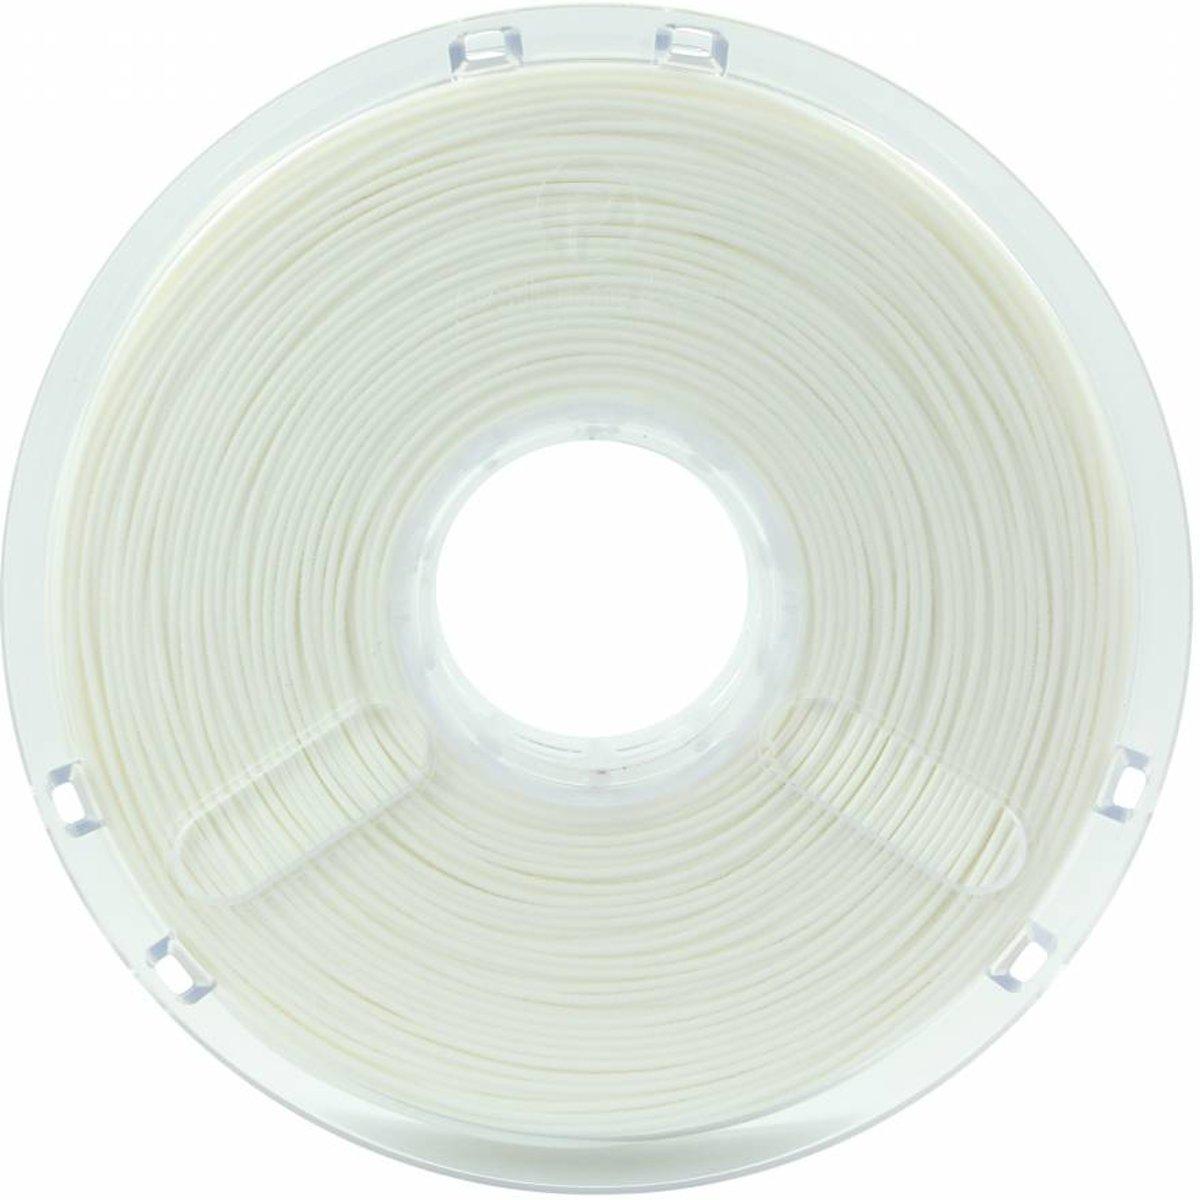 Polymaker Filament voor 3D-printer PolyMax 2.85 mm 0.75 kg Jam Free Technology - True White